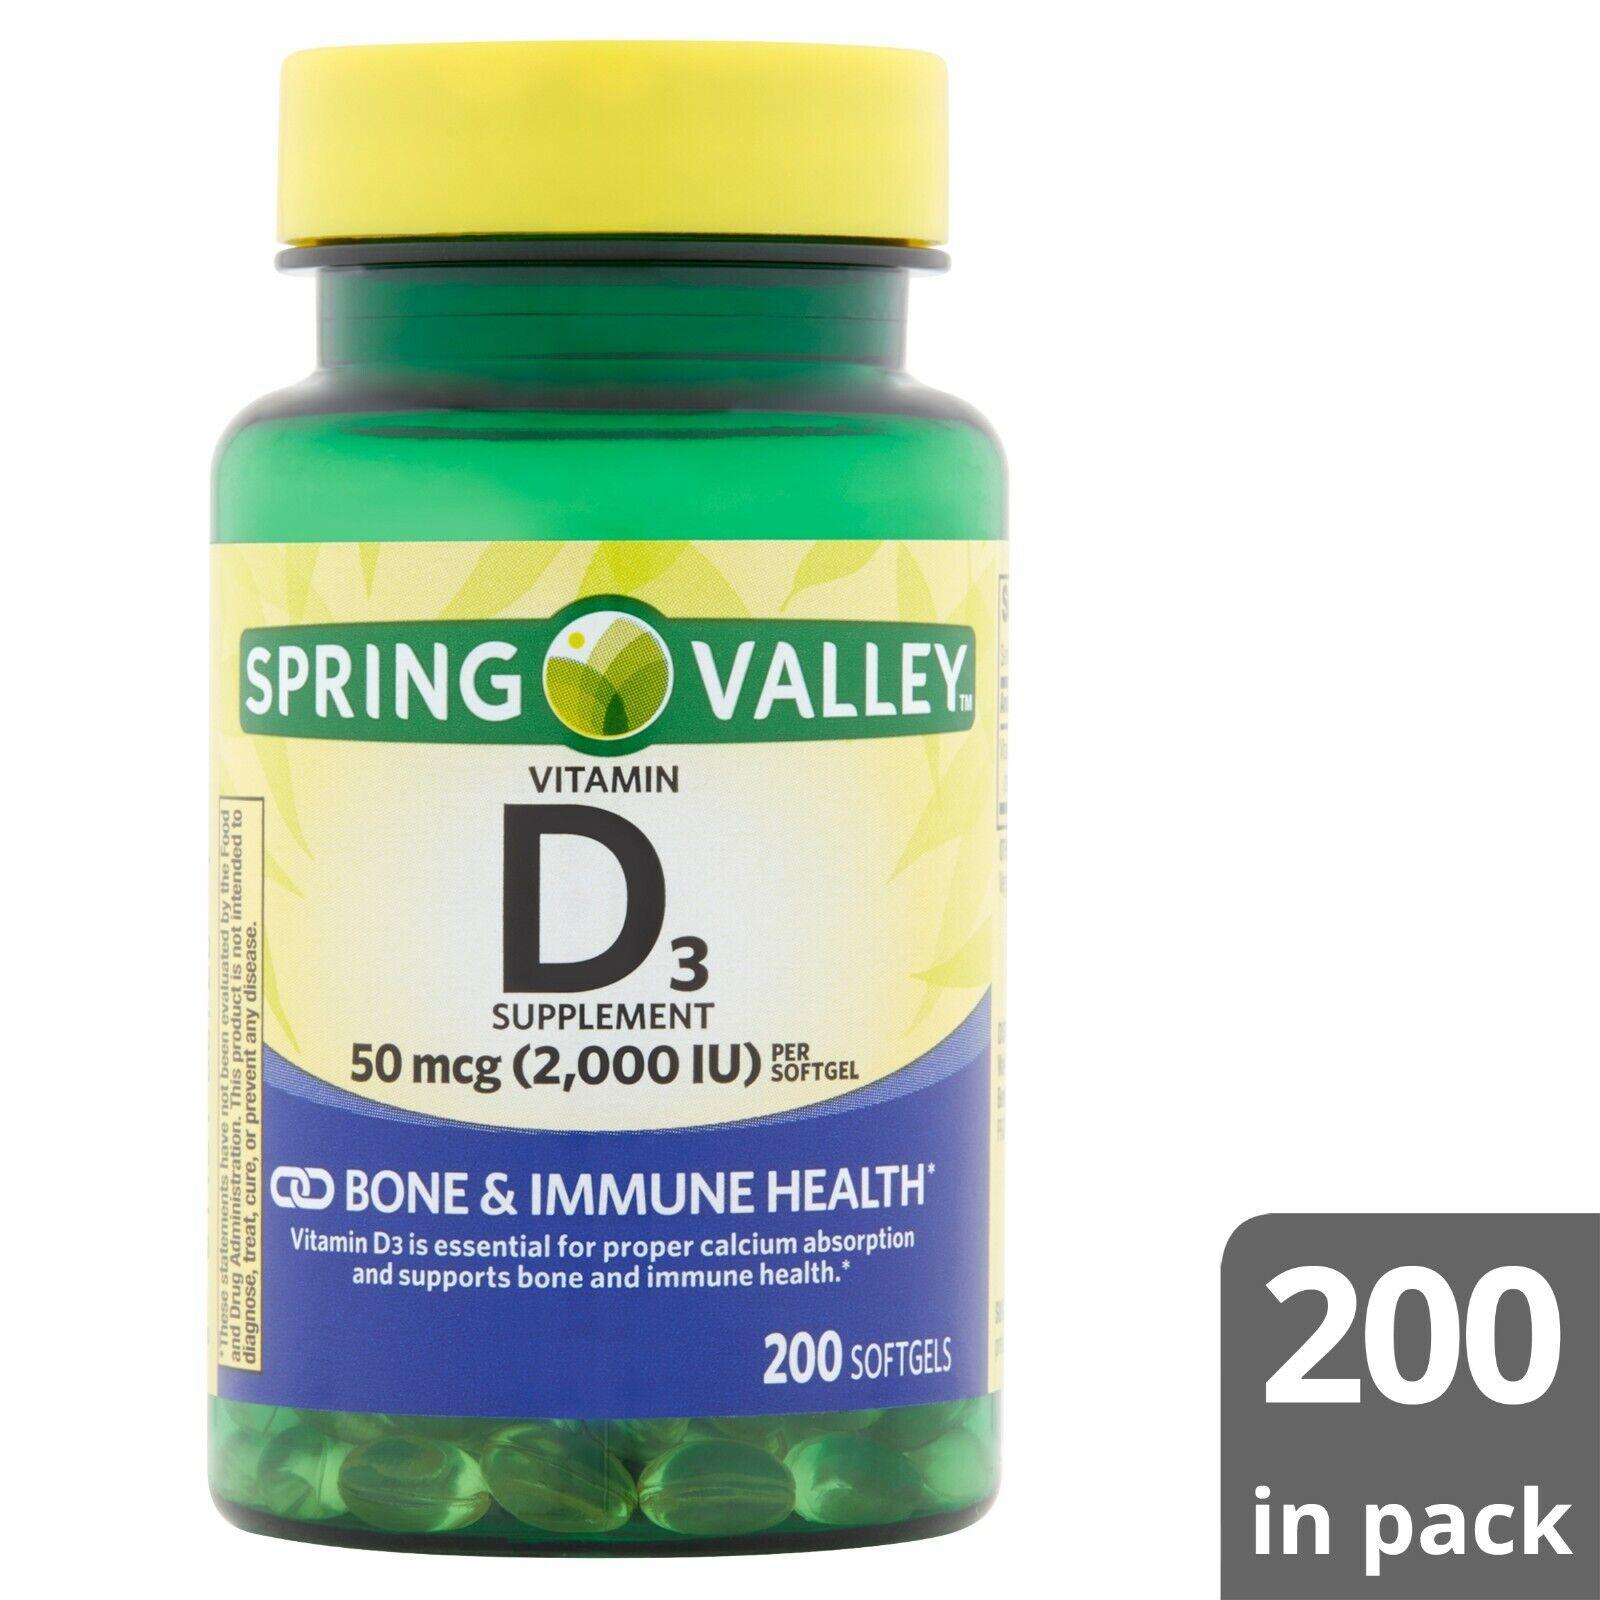 Vitamina D3 2000 IU 200 Softgels Spring Valley Sistema Inmunologico.